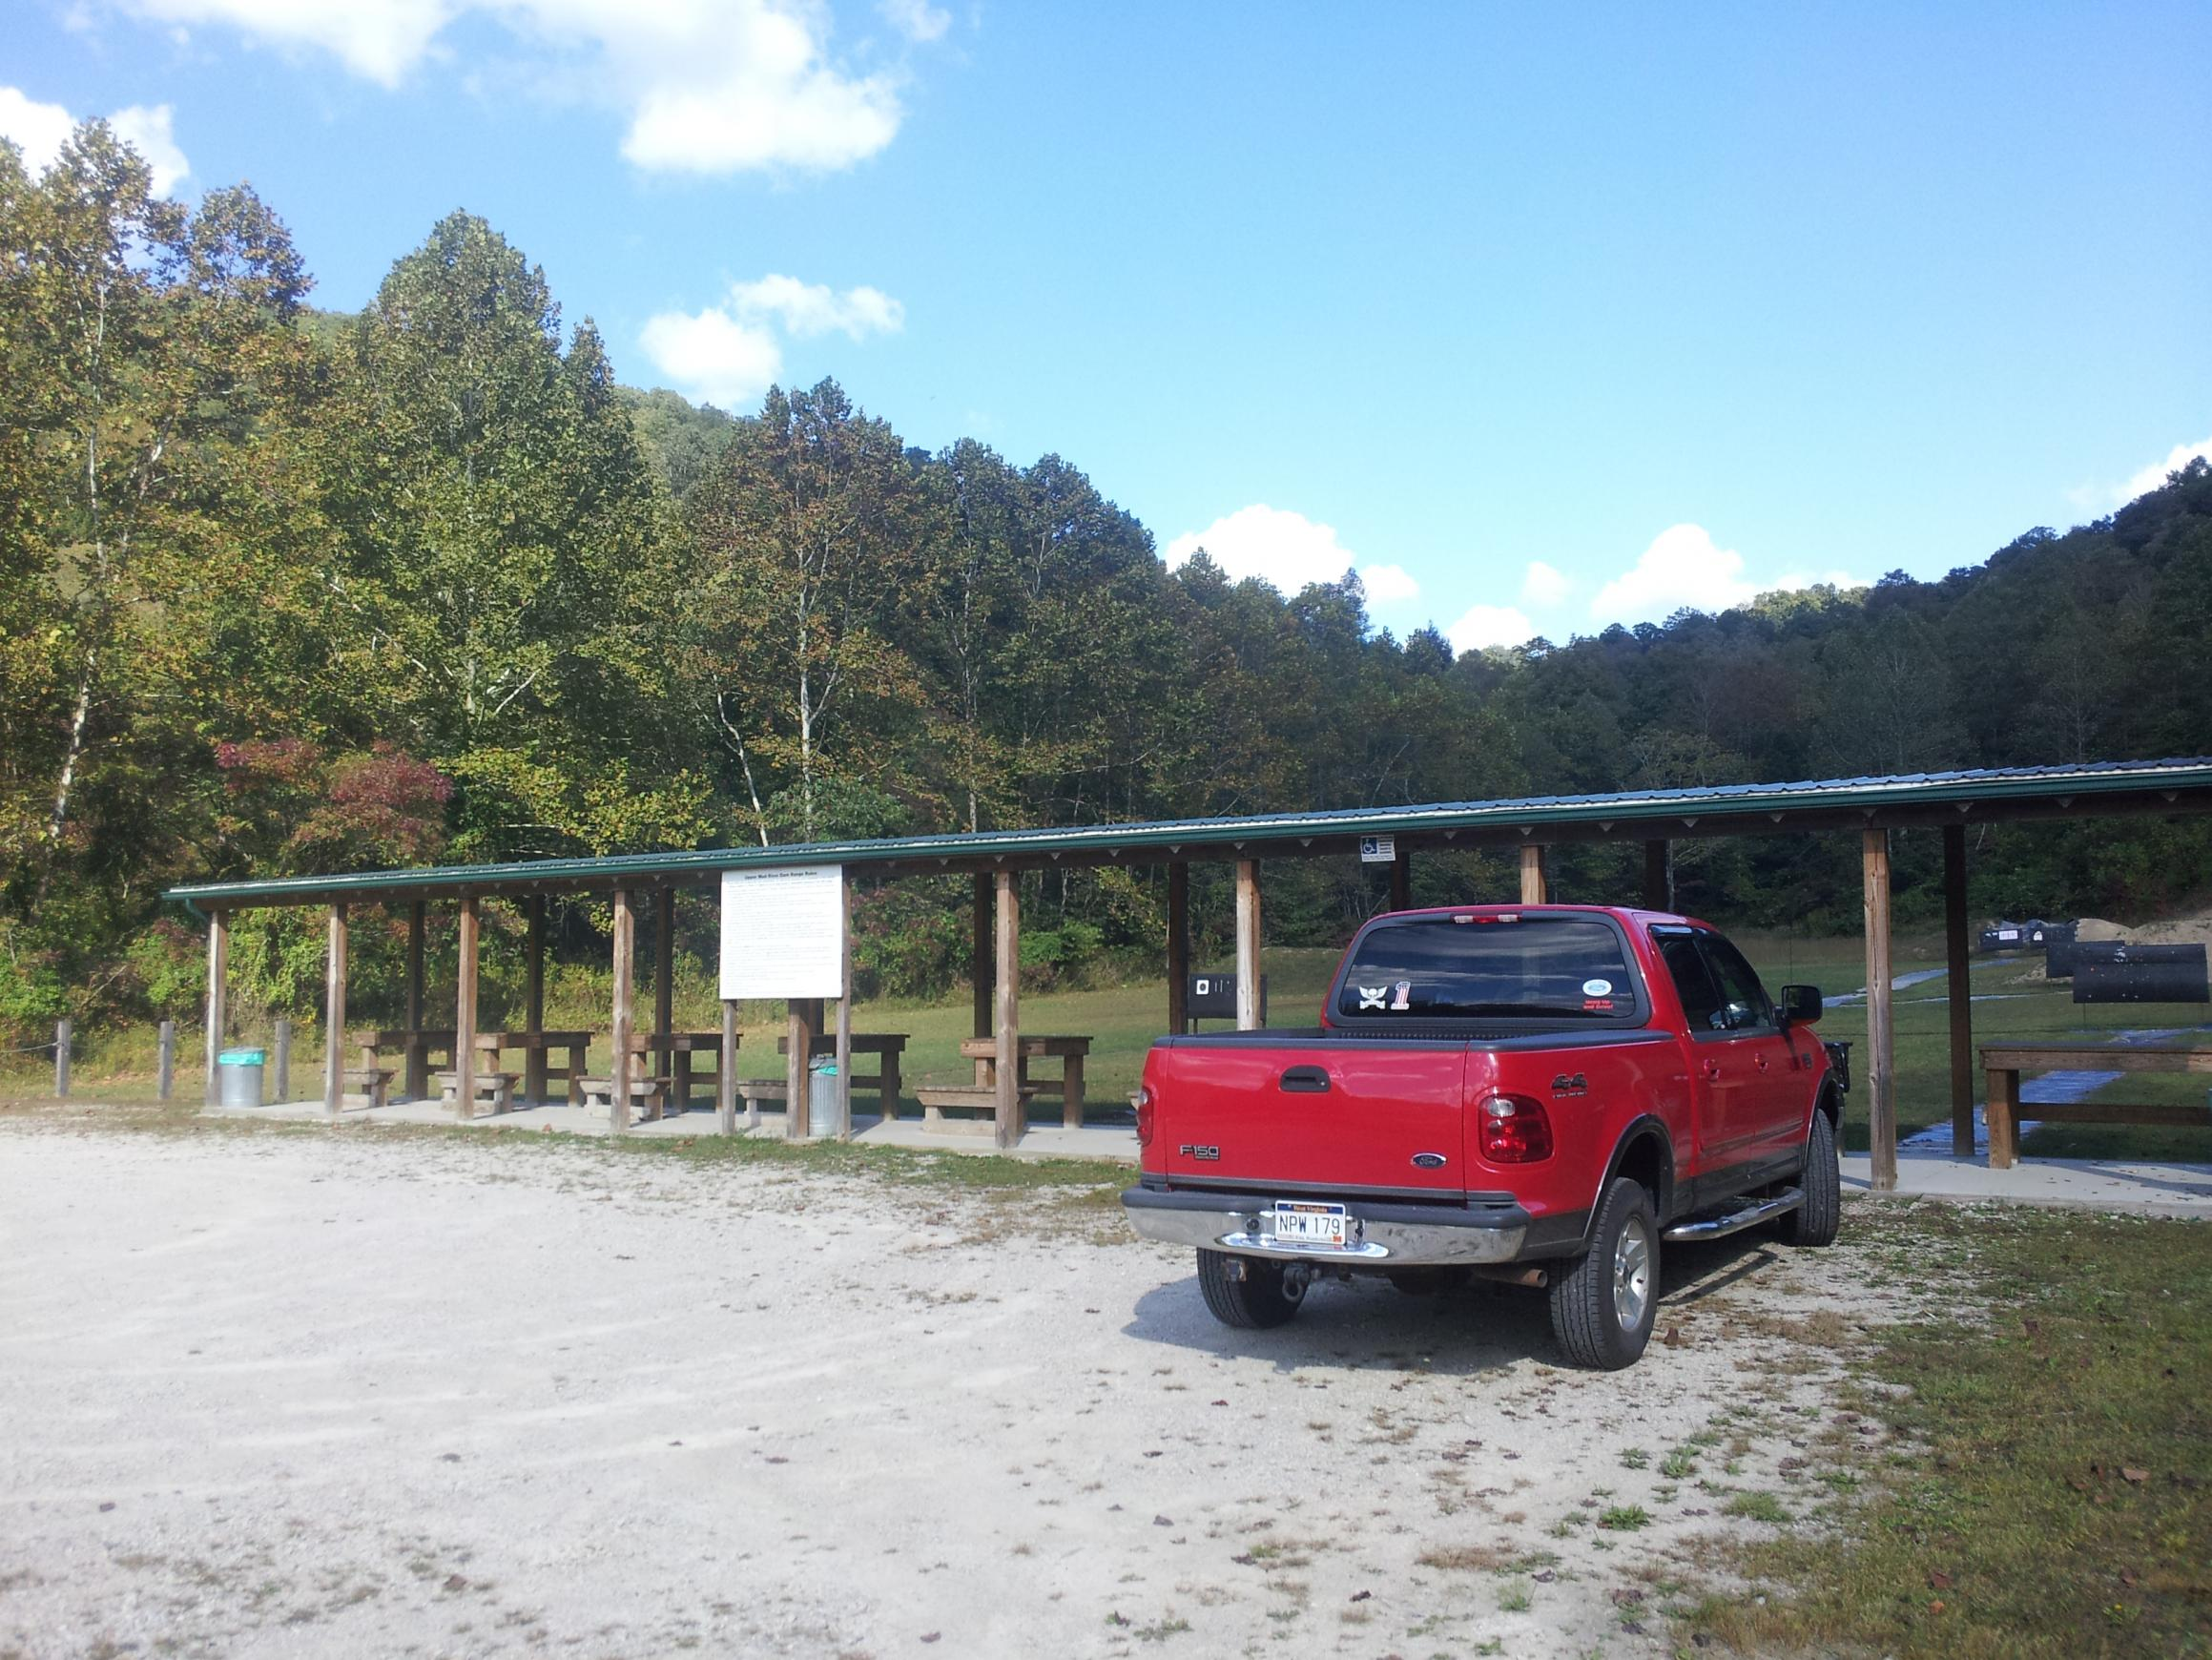 LC9, NAA 22Mag, G22 range day-outdoor-range.jpg